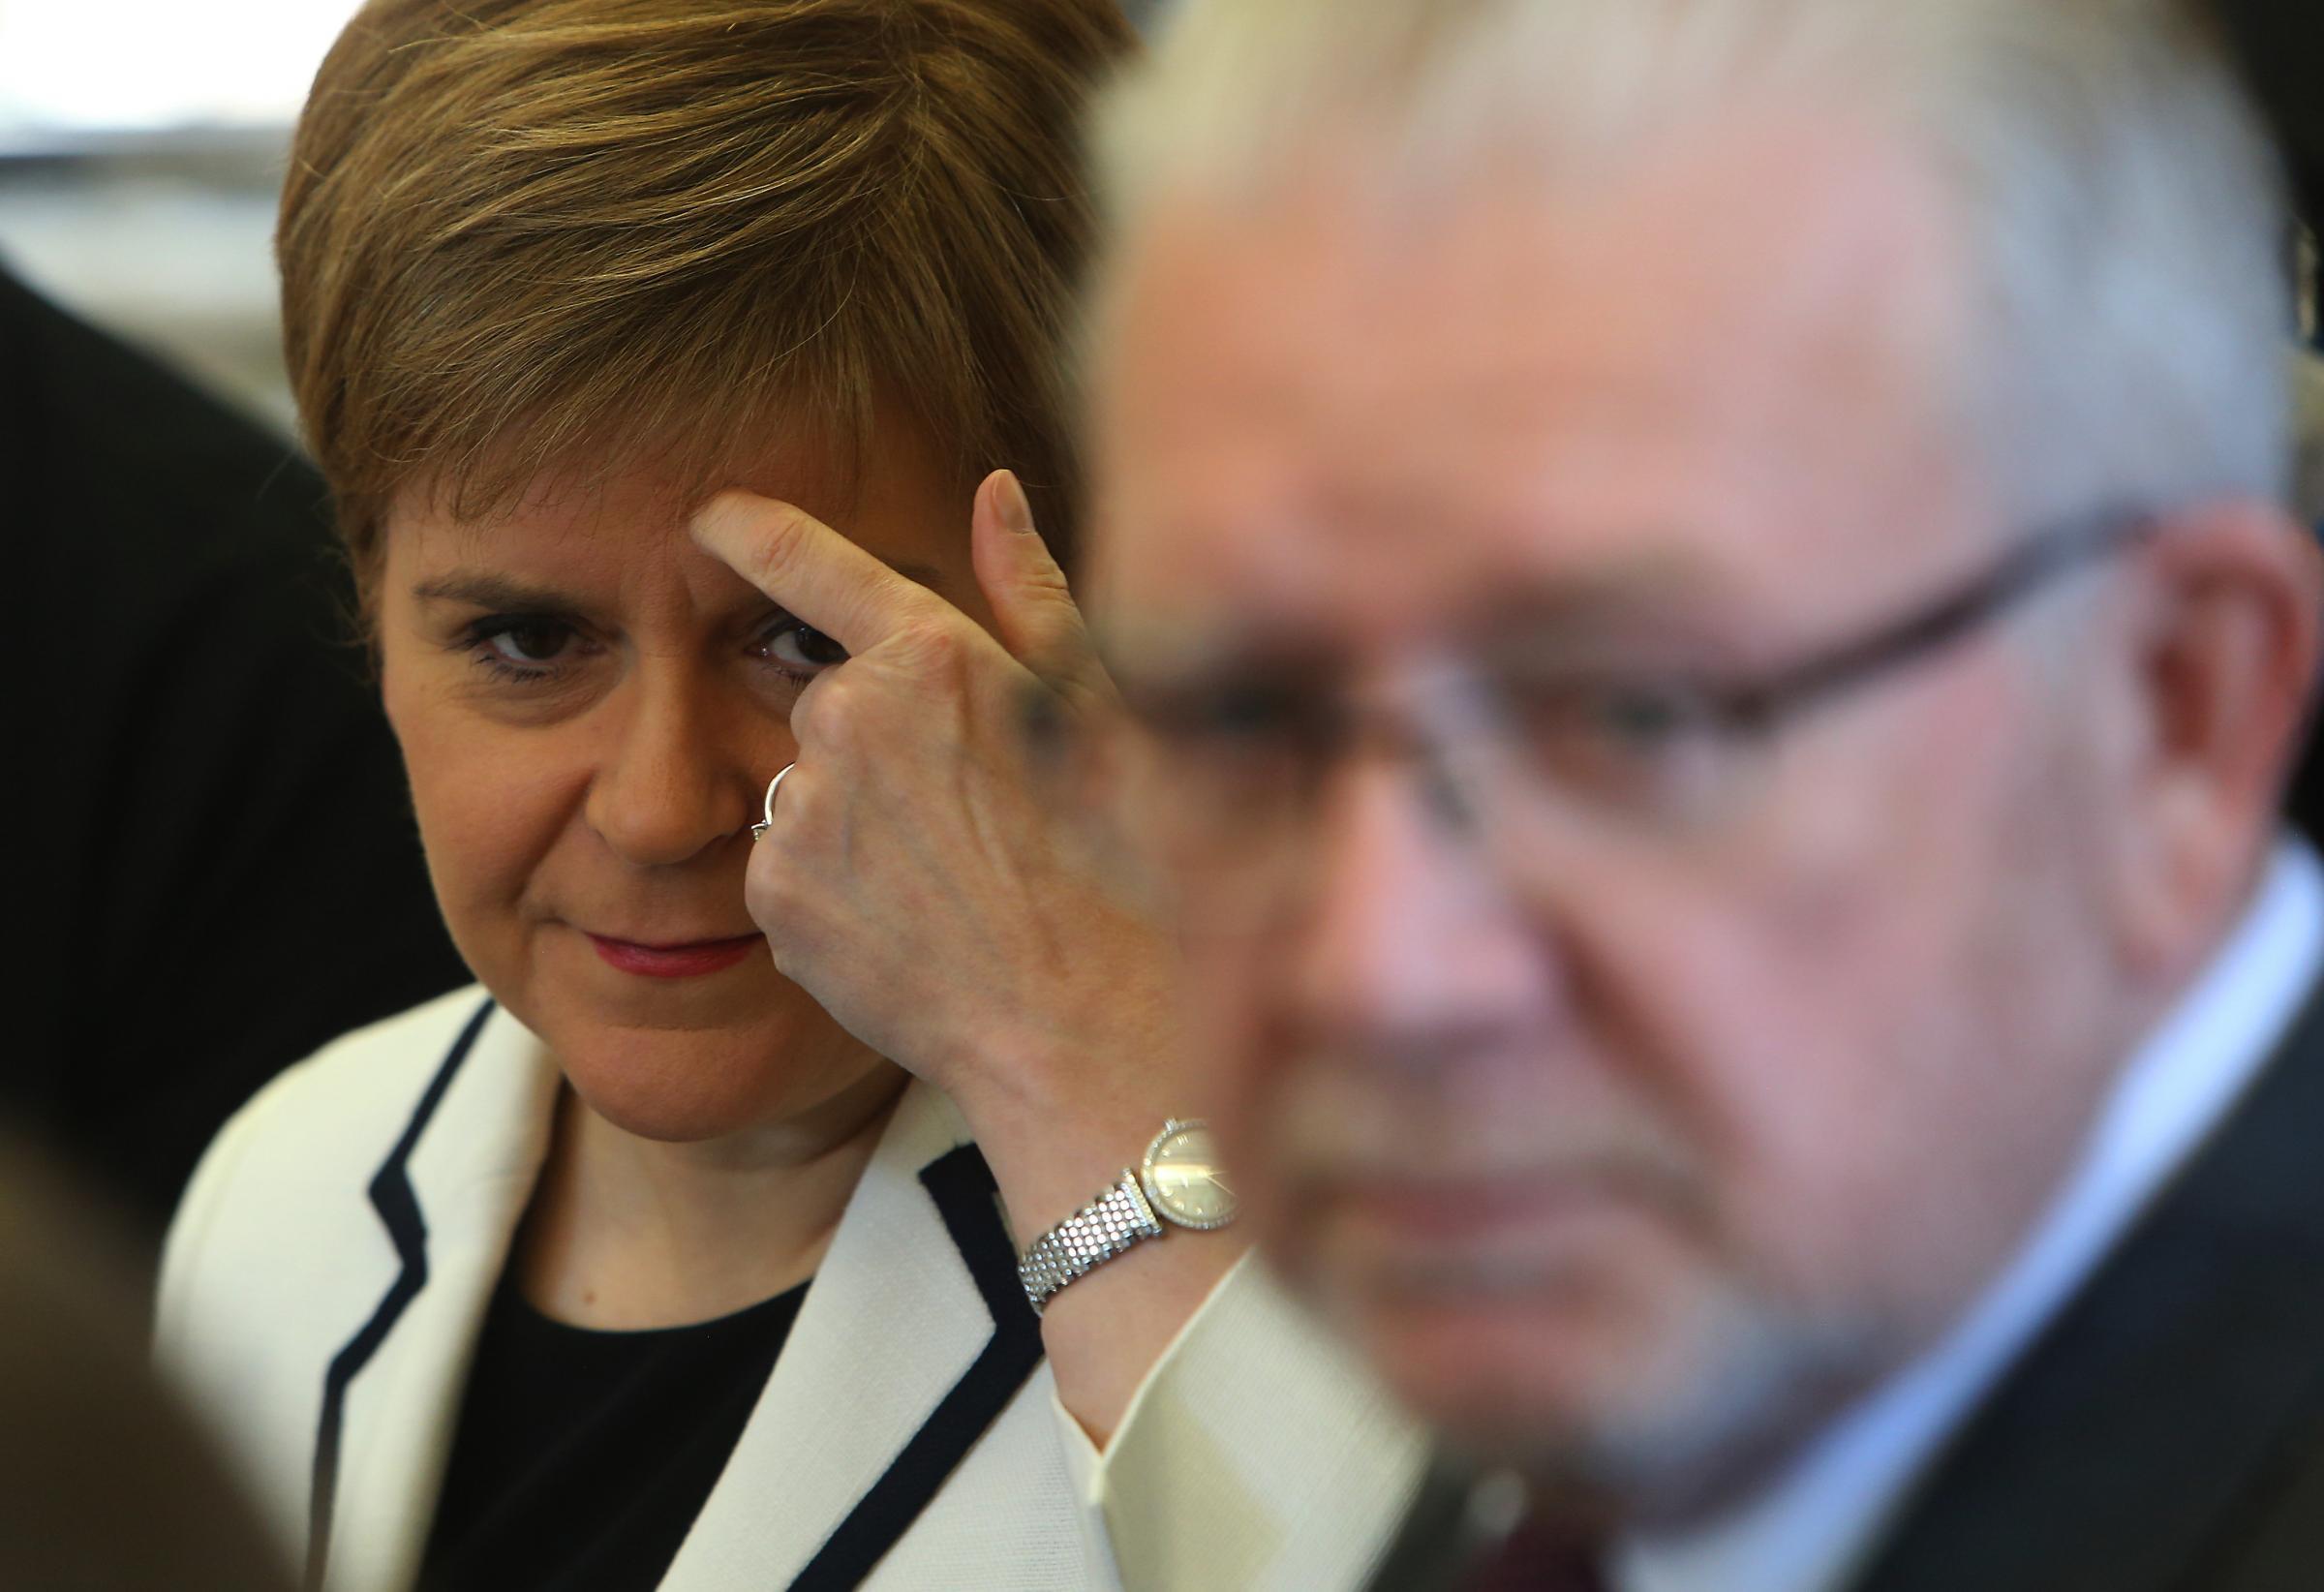 Scottish Tories urge boycott of Citizens Assembly, dismissing it as 'Nationalist stunt'